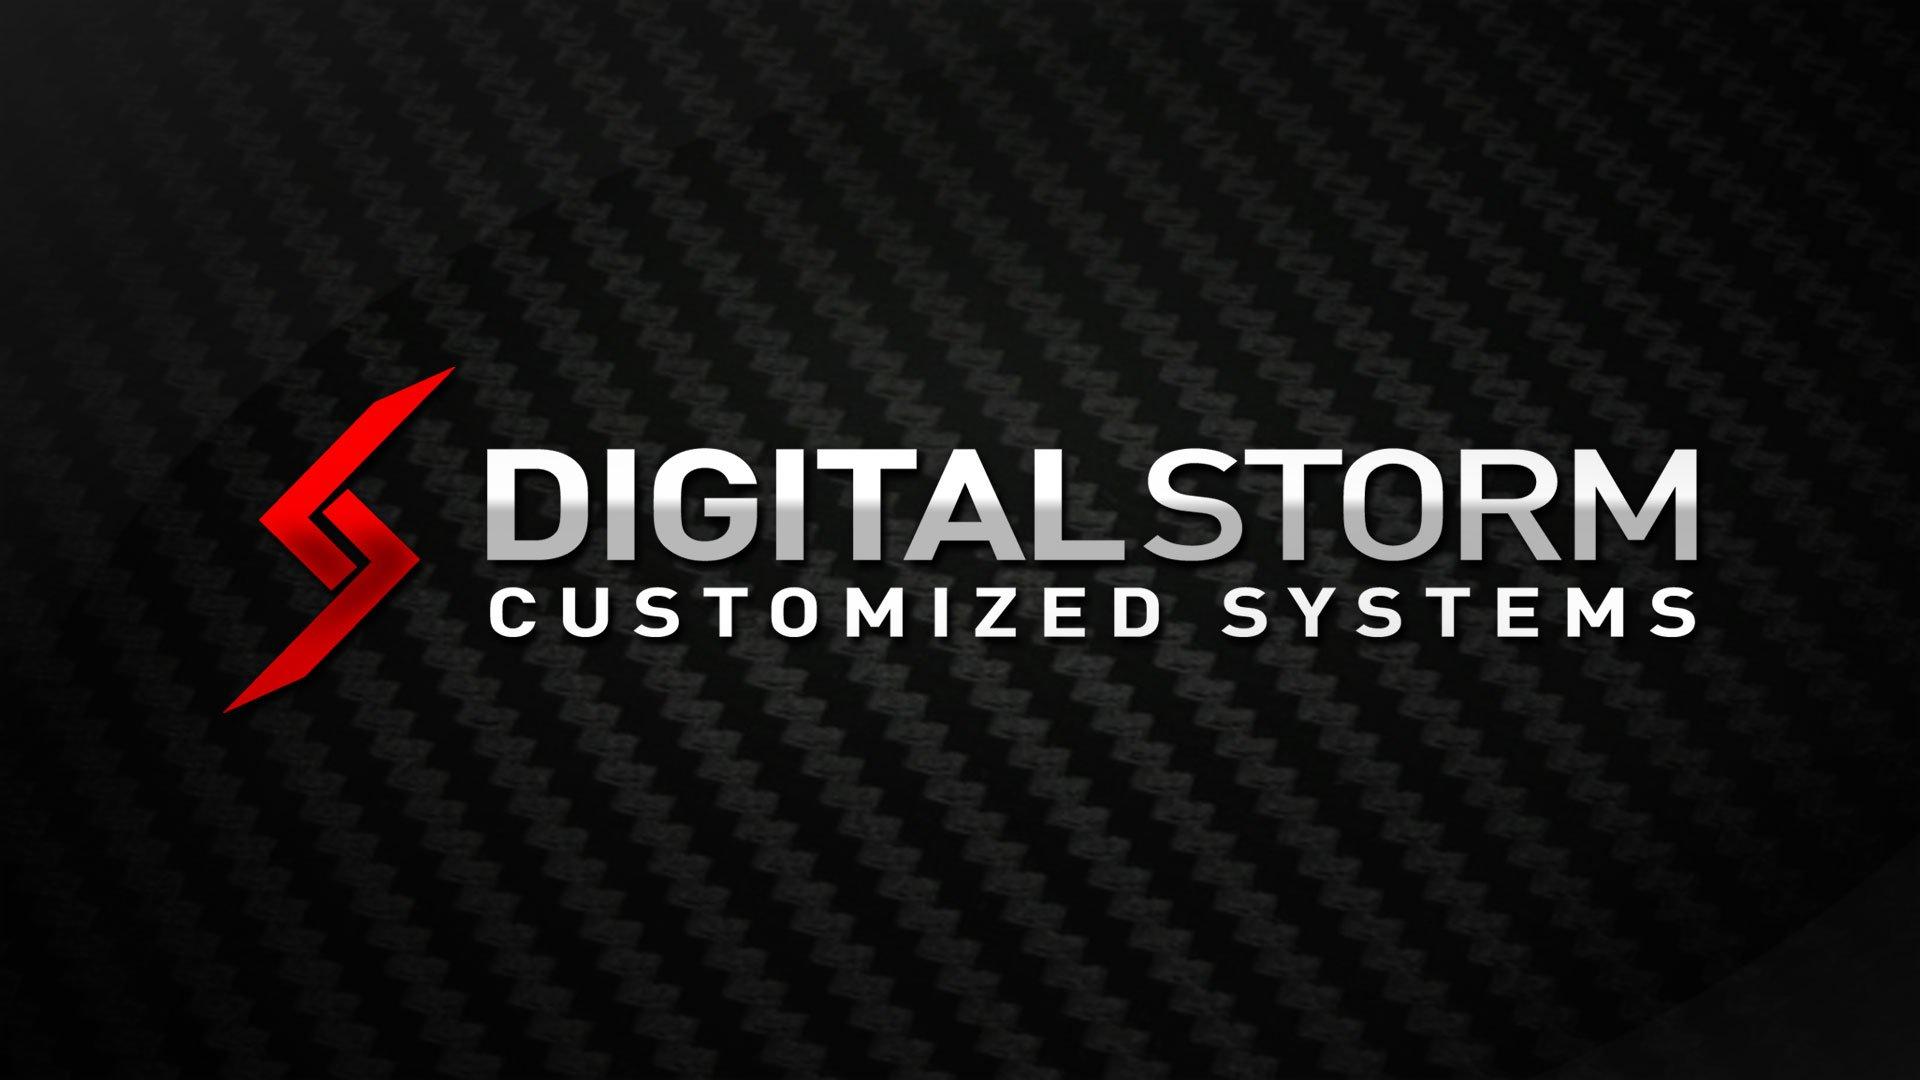 digital storm wallpapers 1920x1200-#main